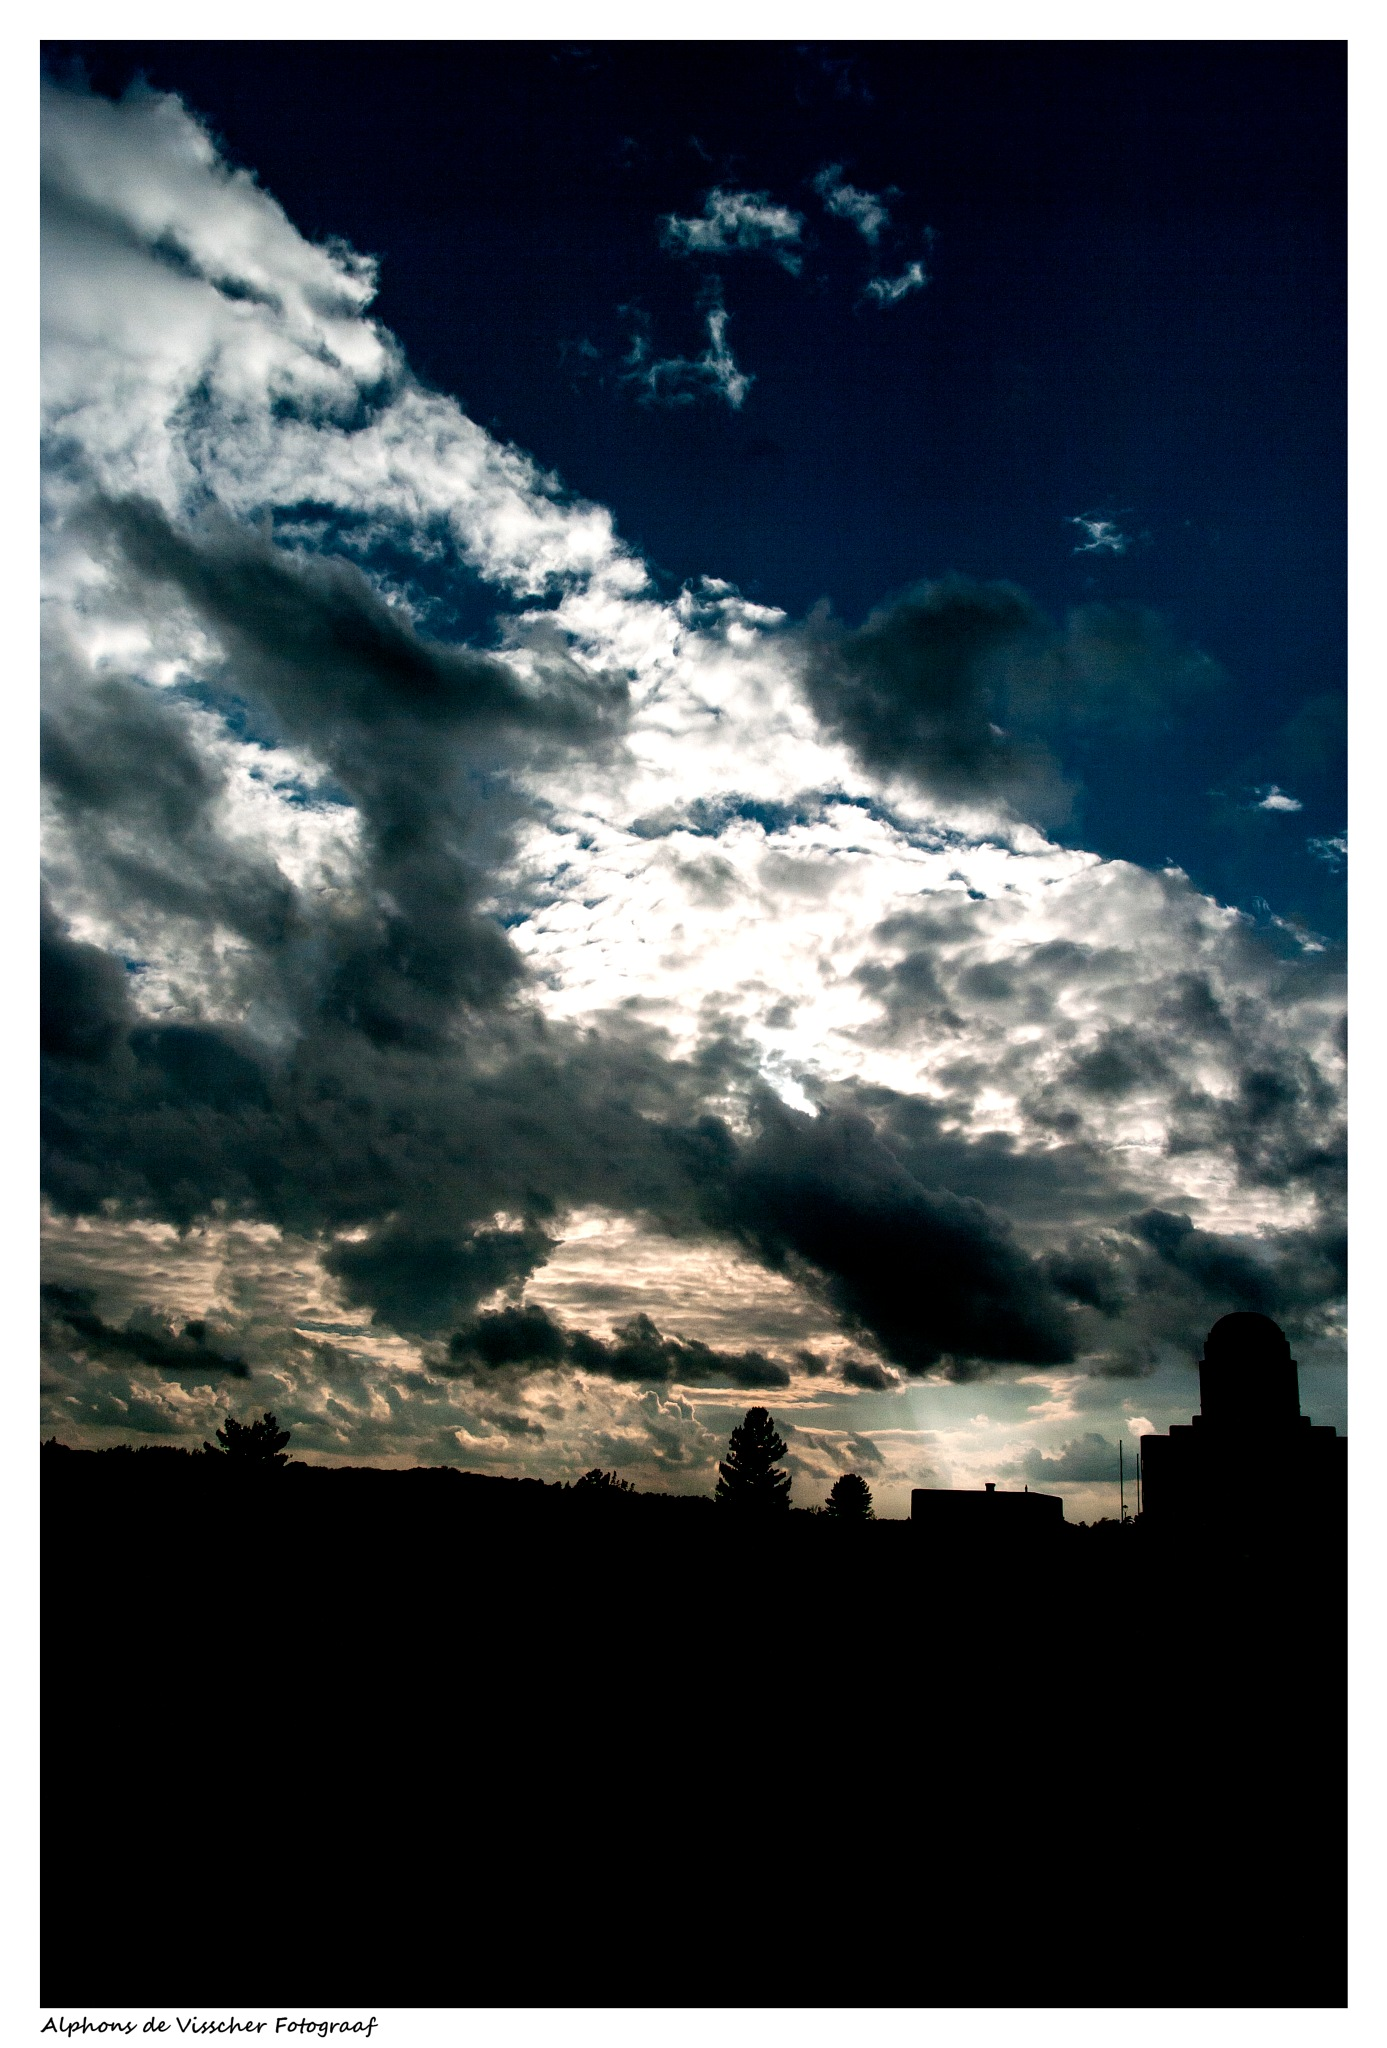 Sunset at Radio Kootwijk by Alphons de Visscher Fotograaf